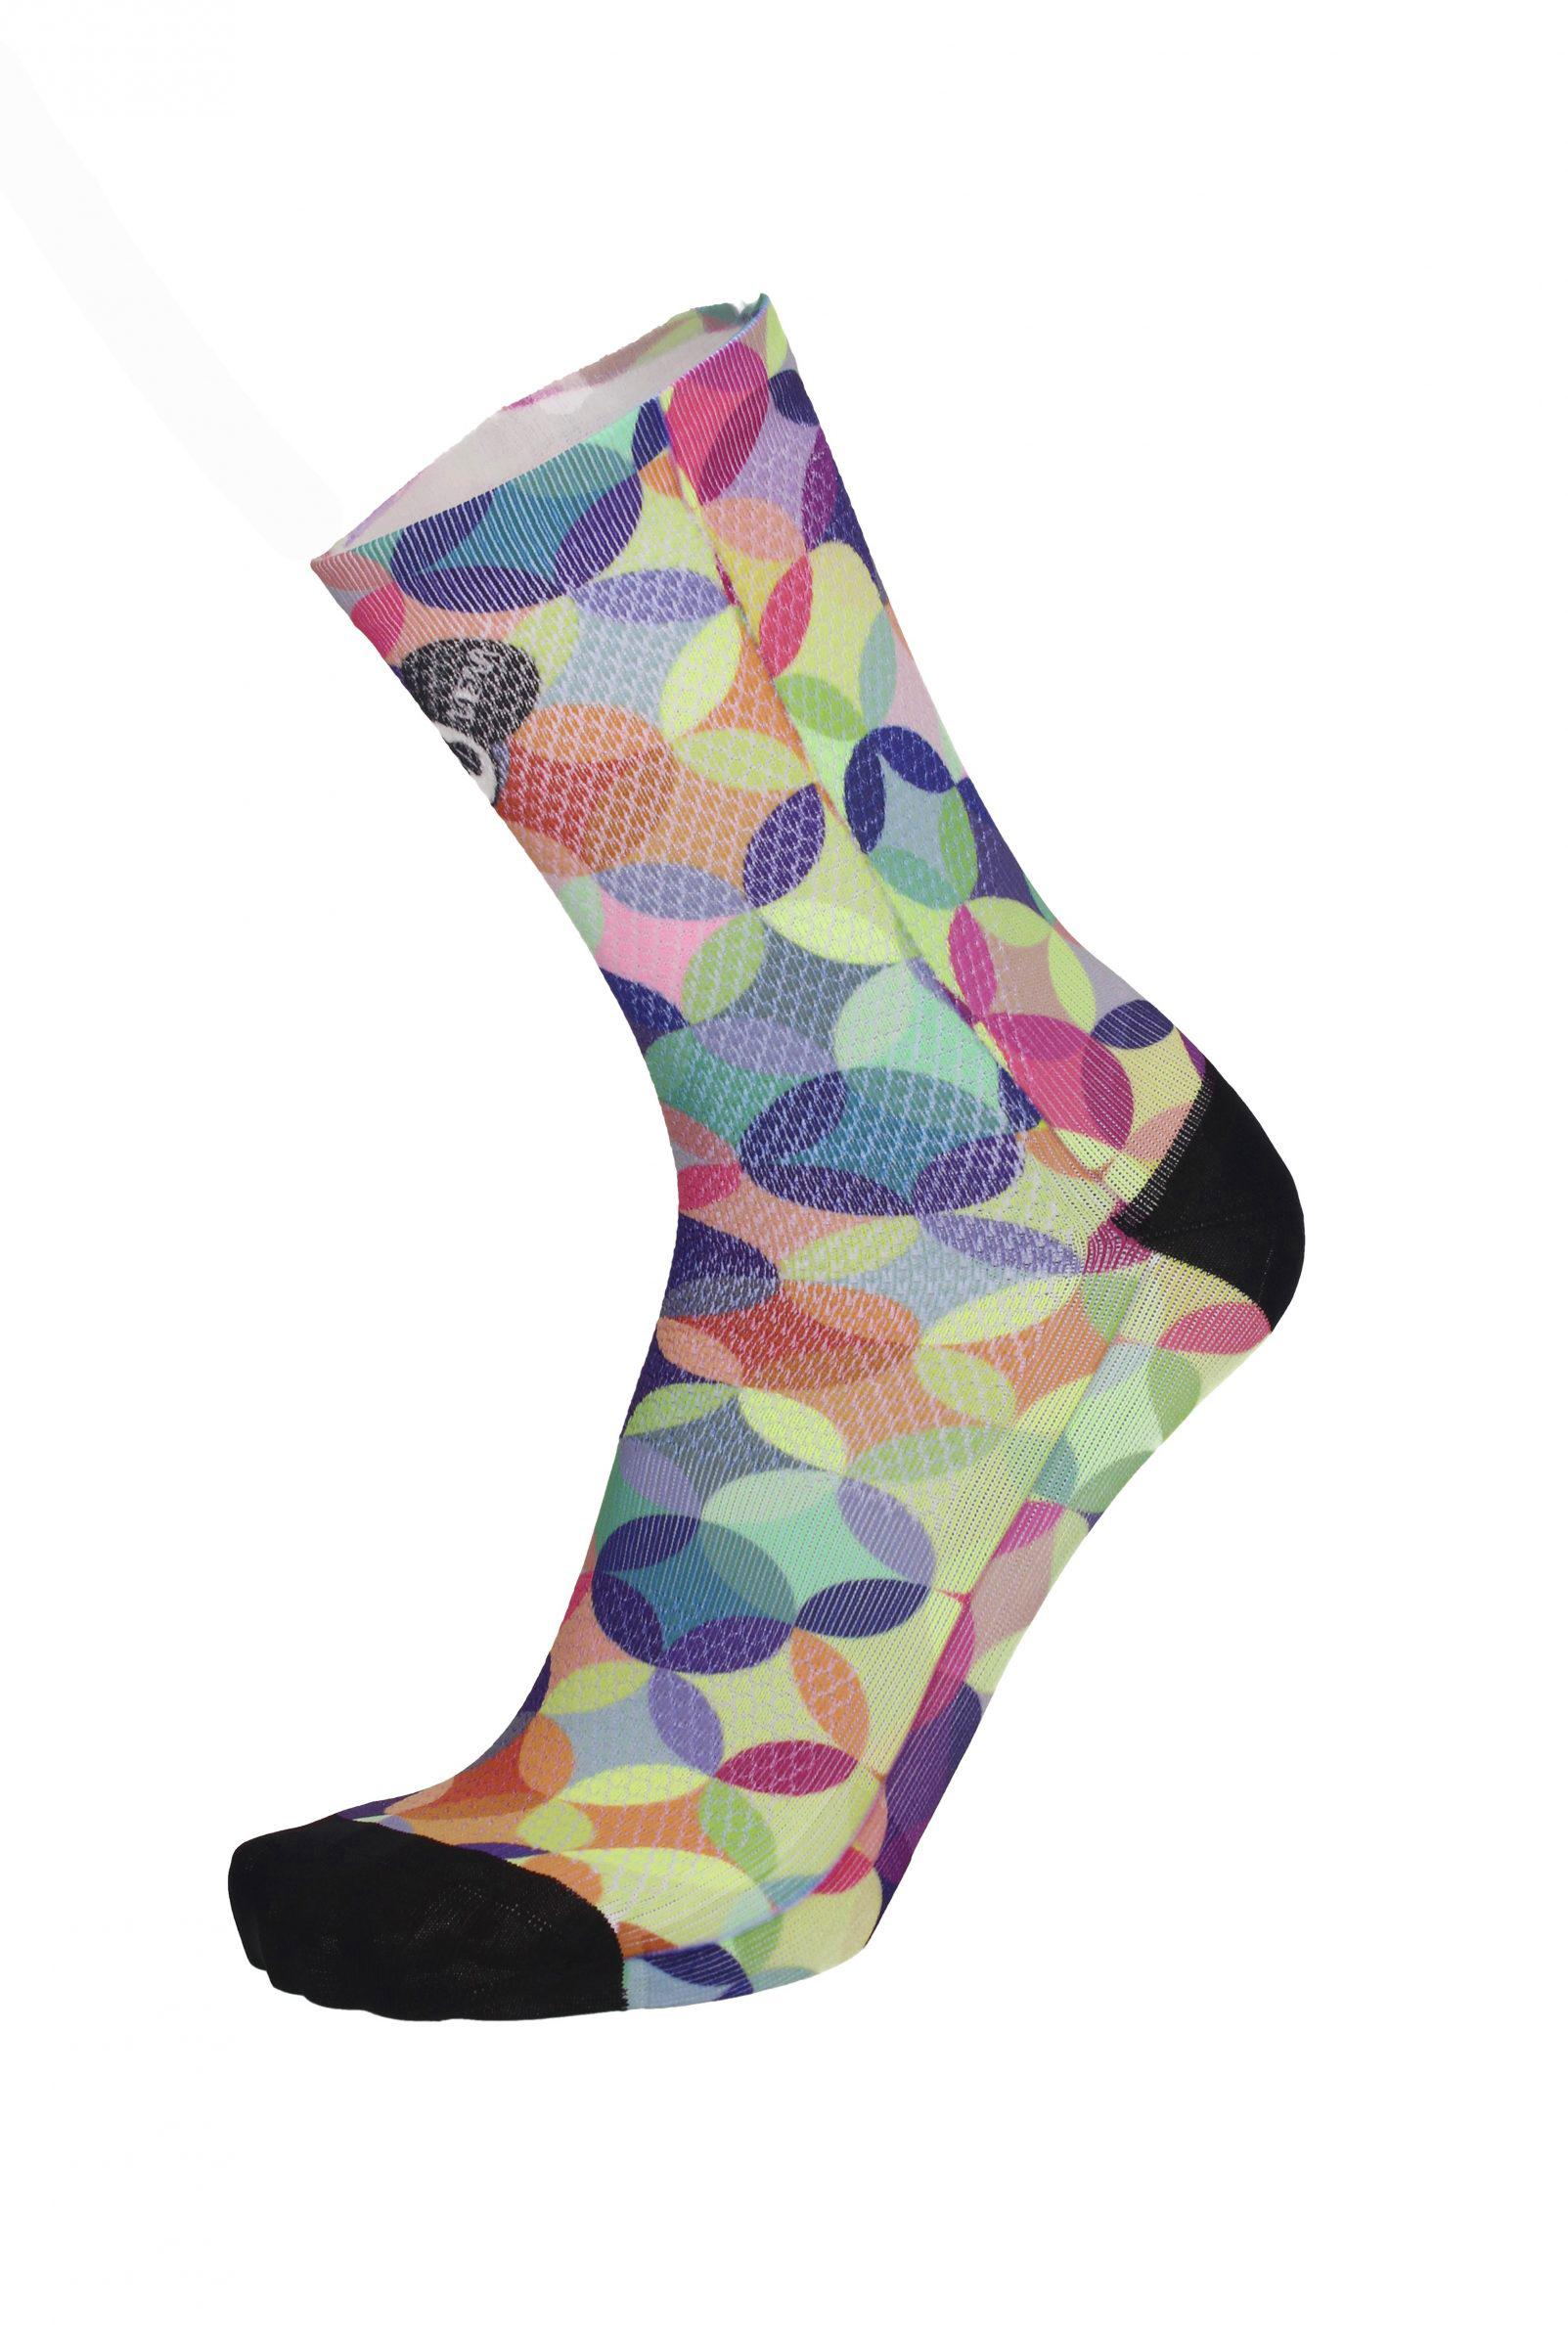 Čarape MBWear FUN 15 Future